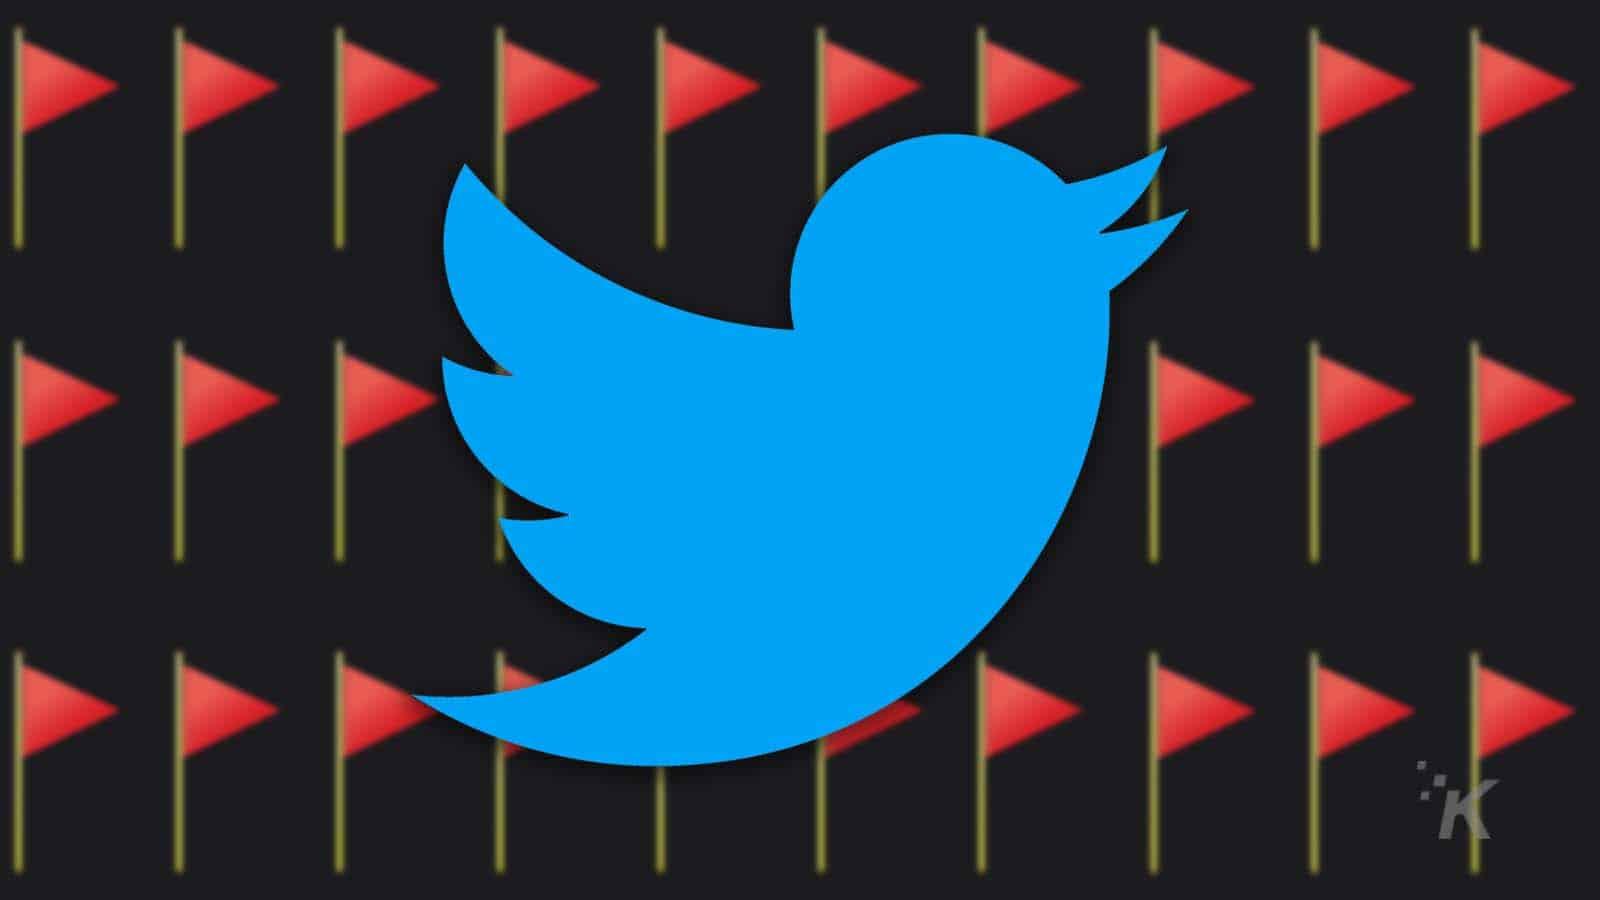 twitter red flag emoji